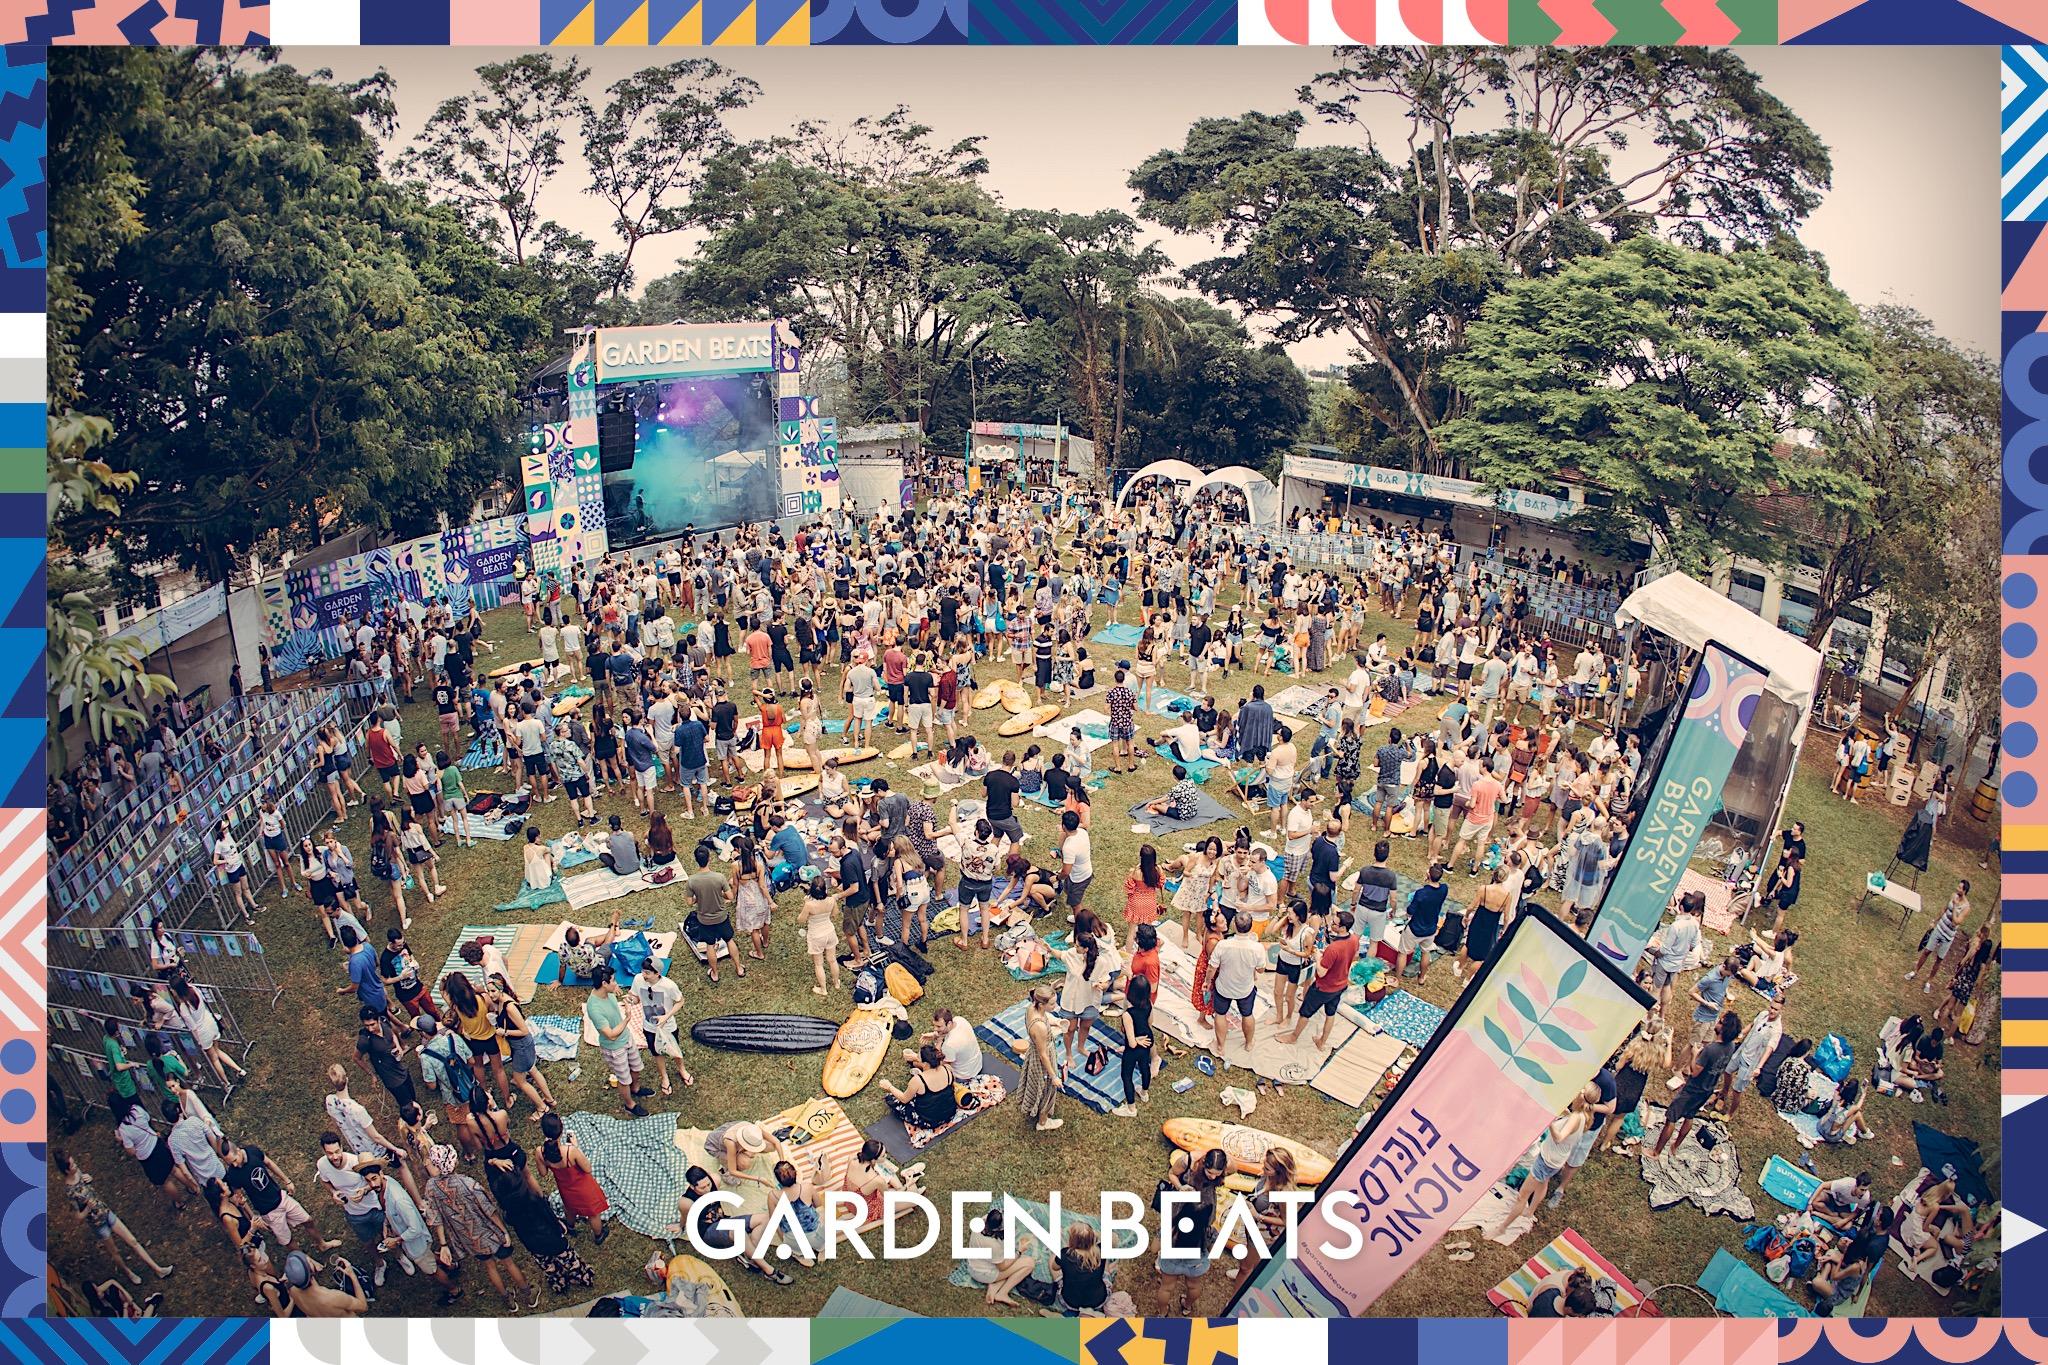 03032018_GardenBeats_Colossal561_Watermarked.jpg